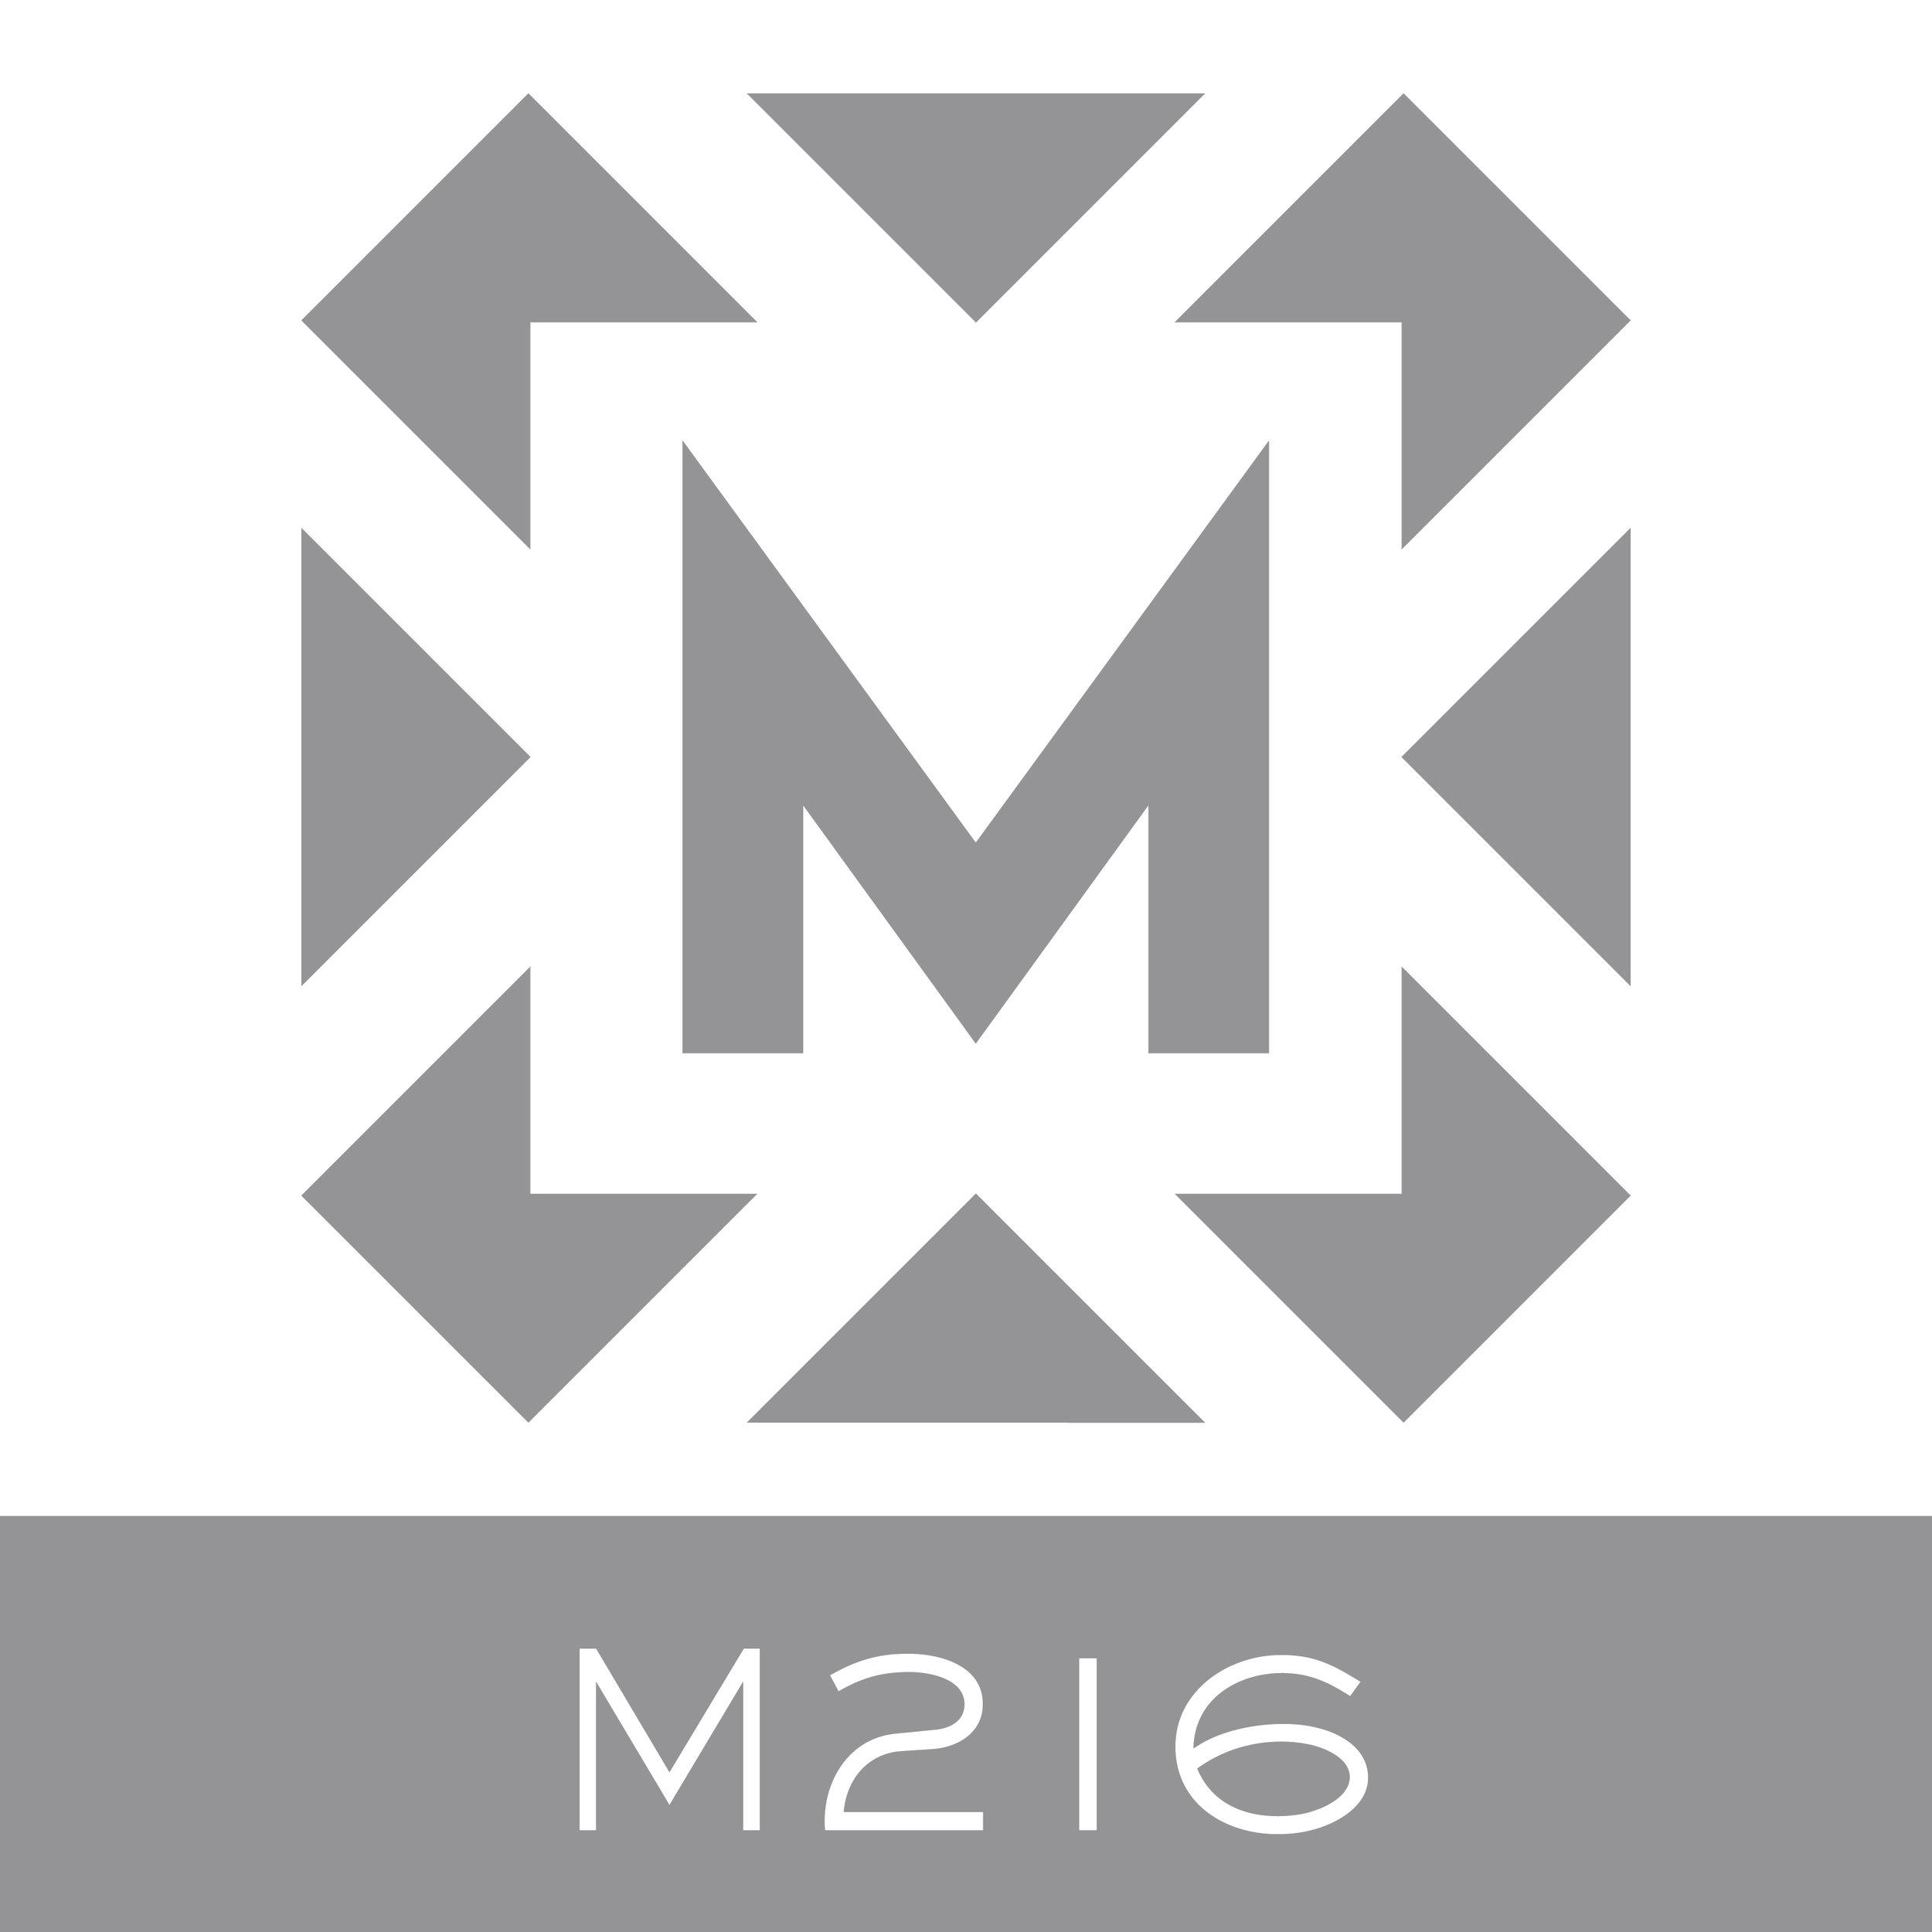 M216.jpg